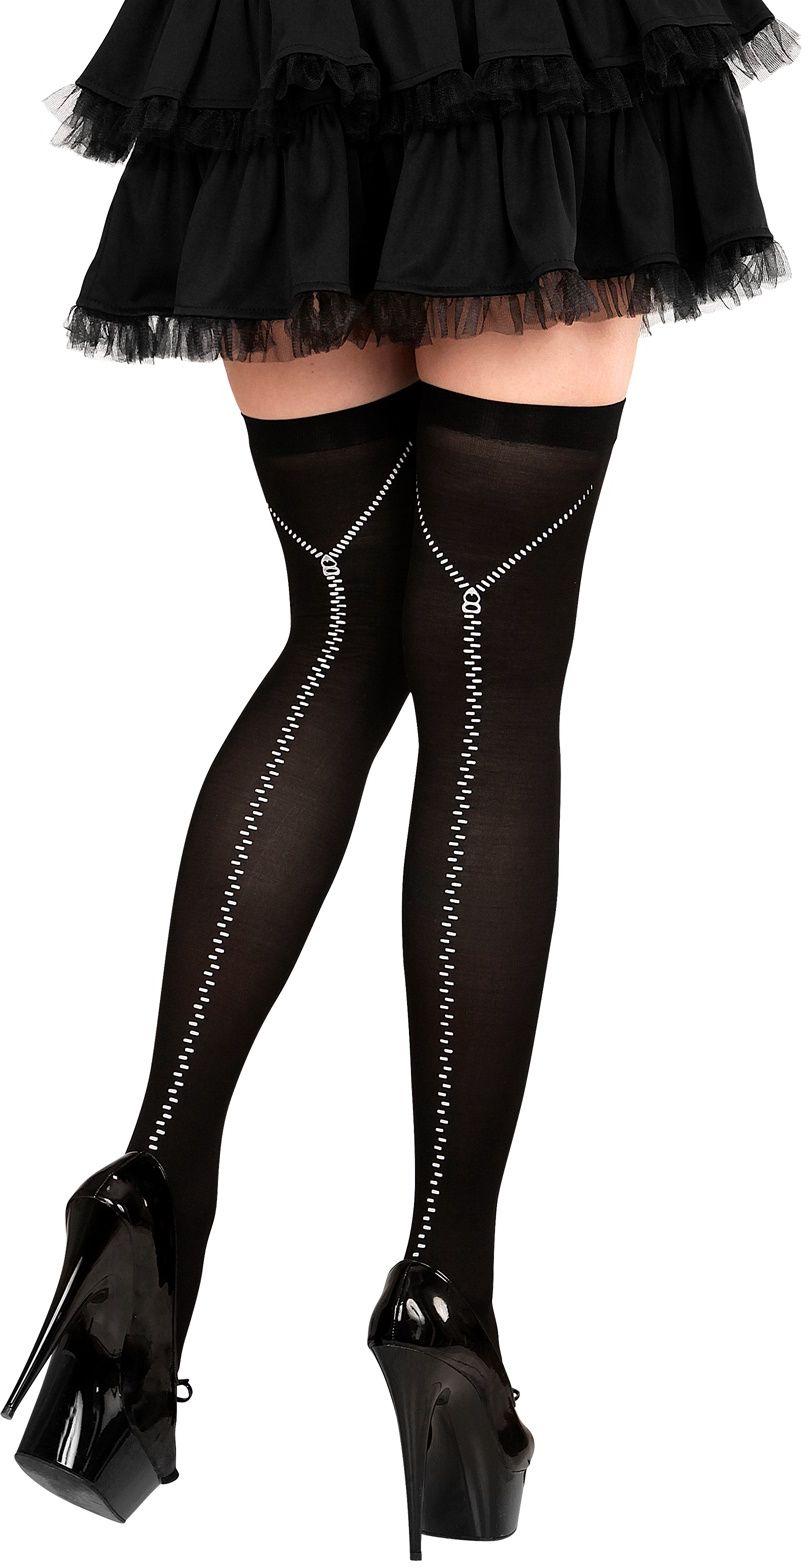 Zwarte knie kousen met rits